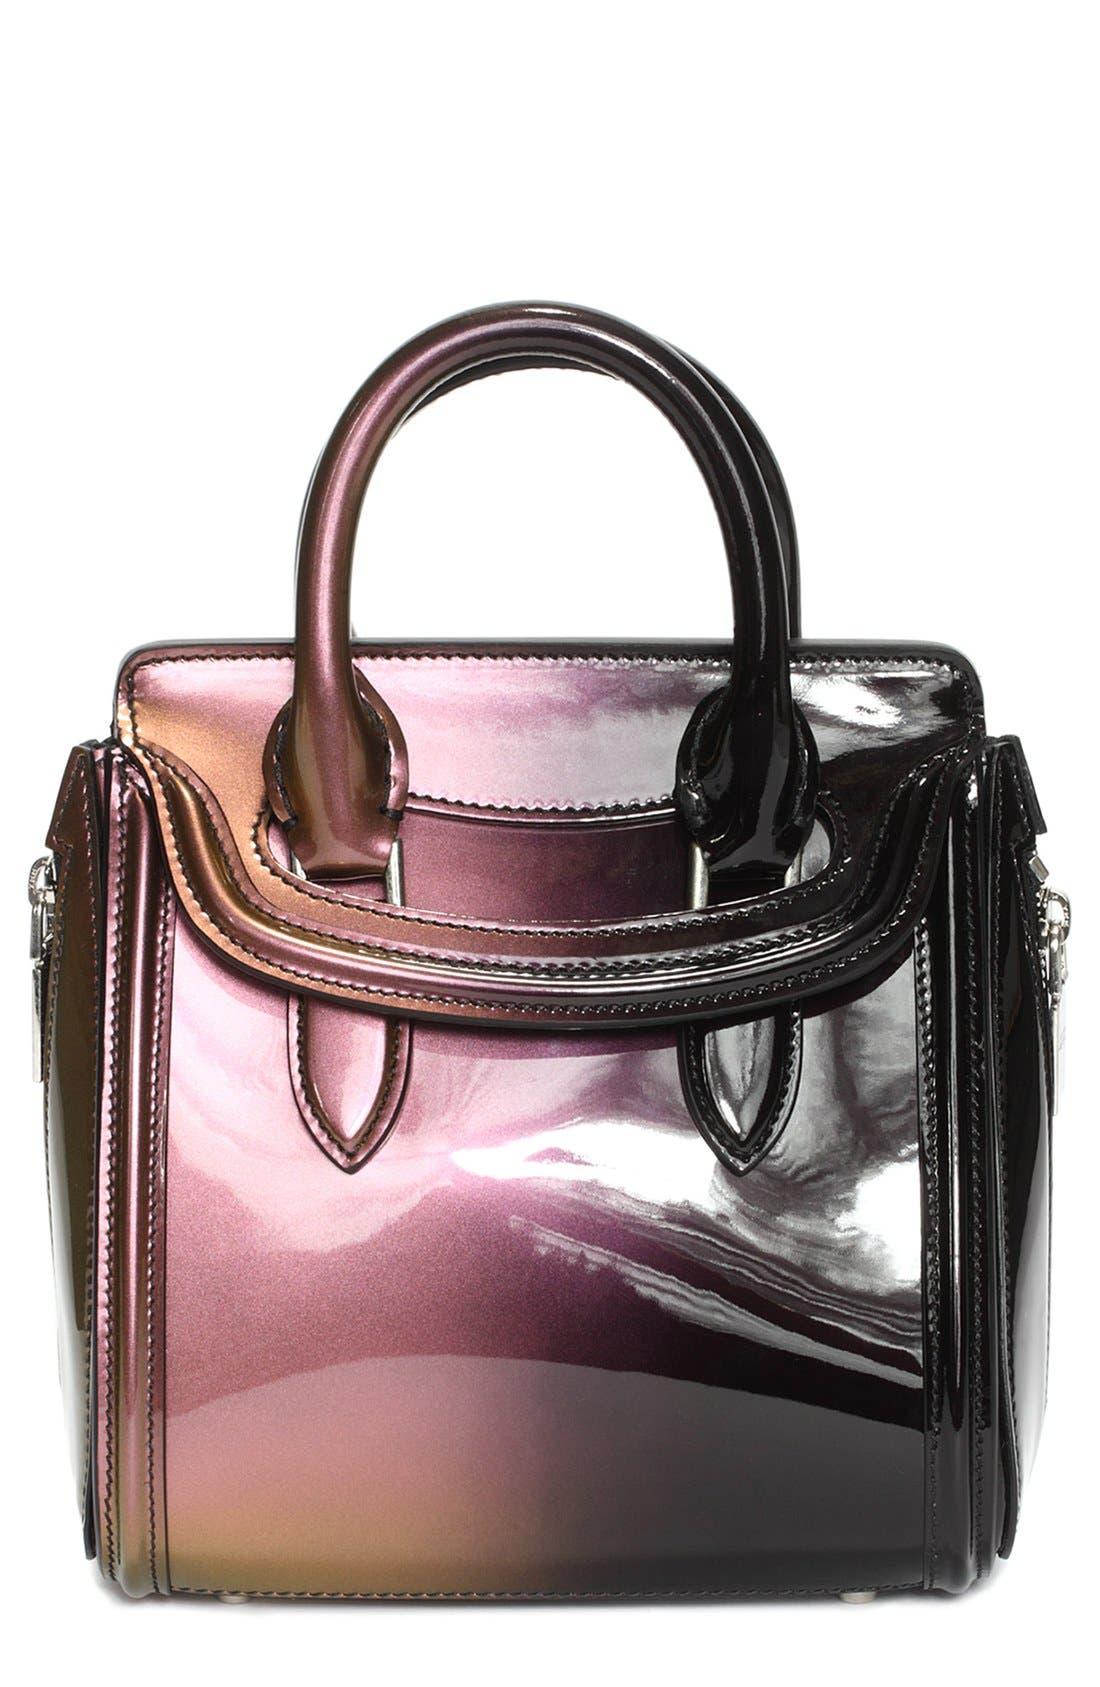 Alternate Image 1 Selected - Alexander McQueen 'Mini Heroine' Patent Leather Satchel